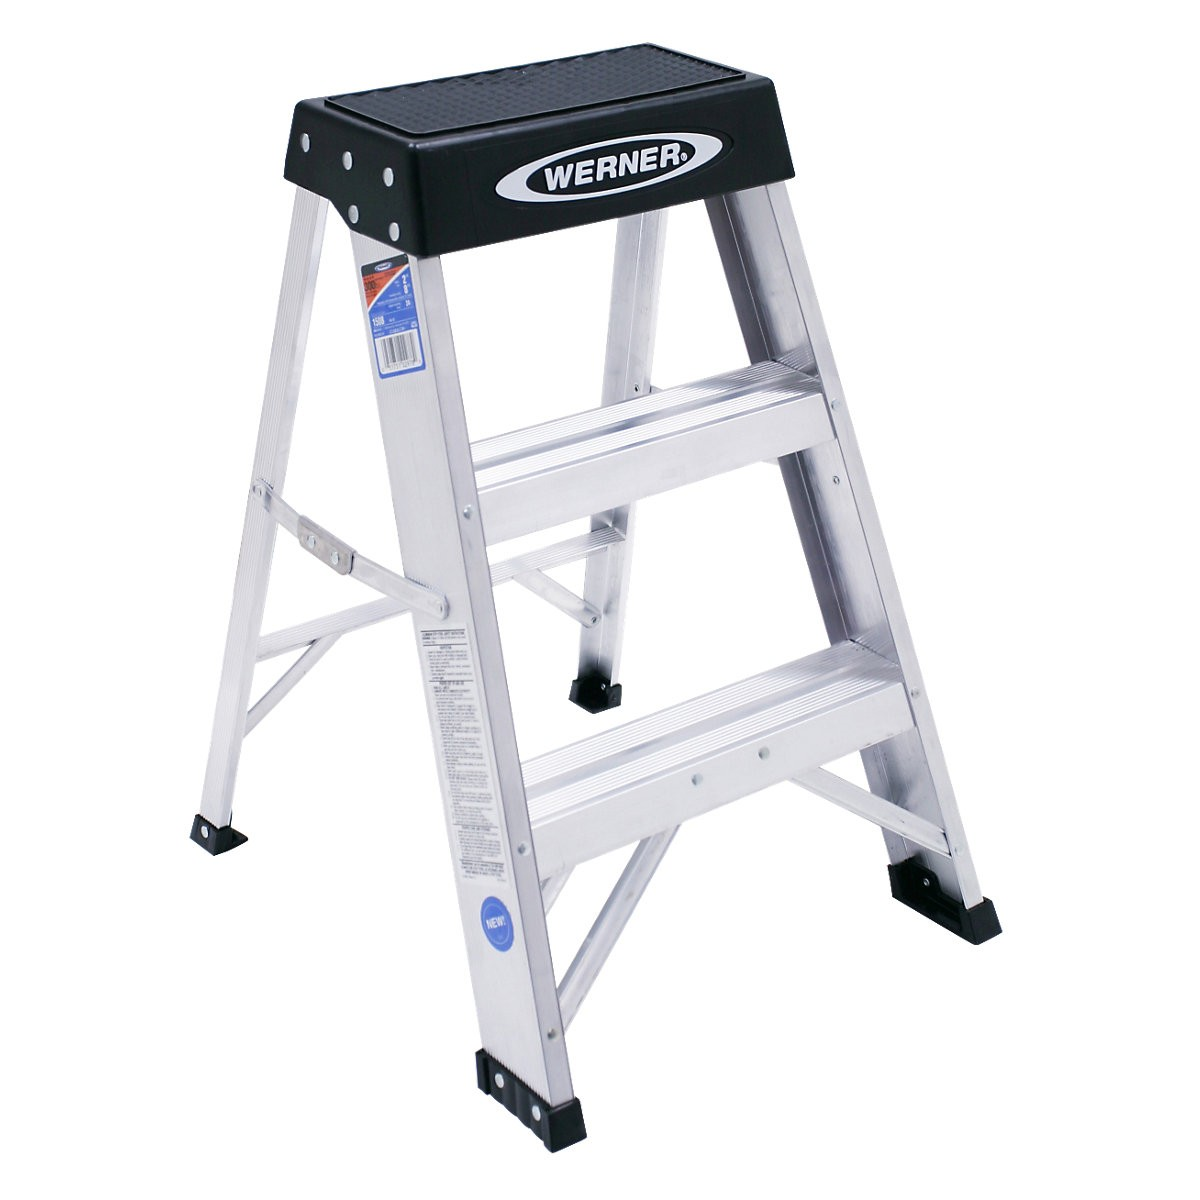 Buy The Werner 150b Aluminum Step Stool Type Ia 2 Ft